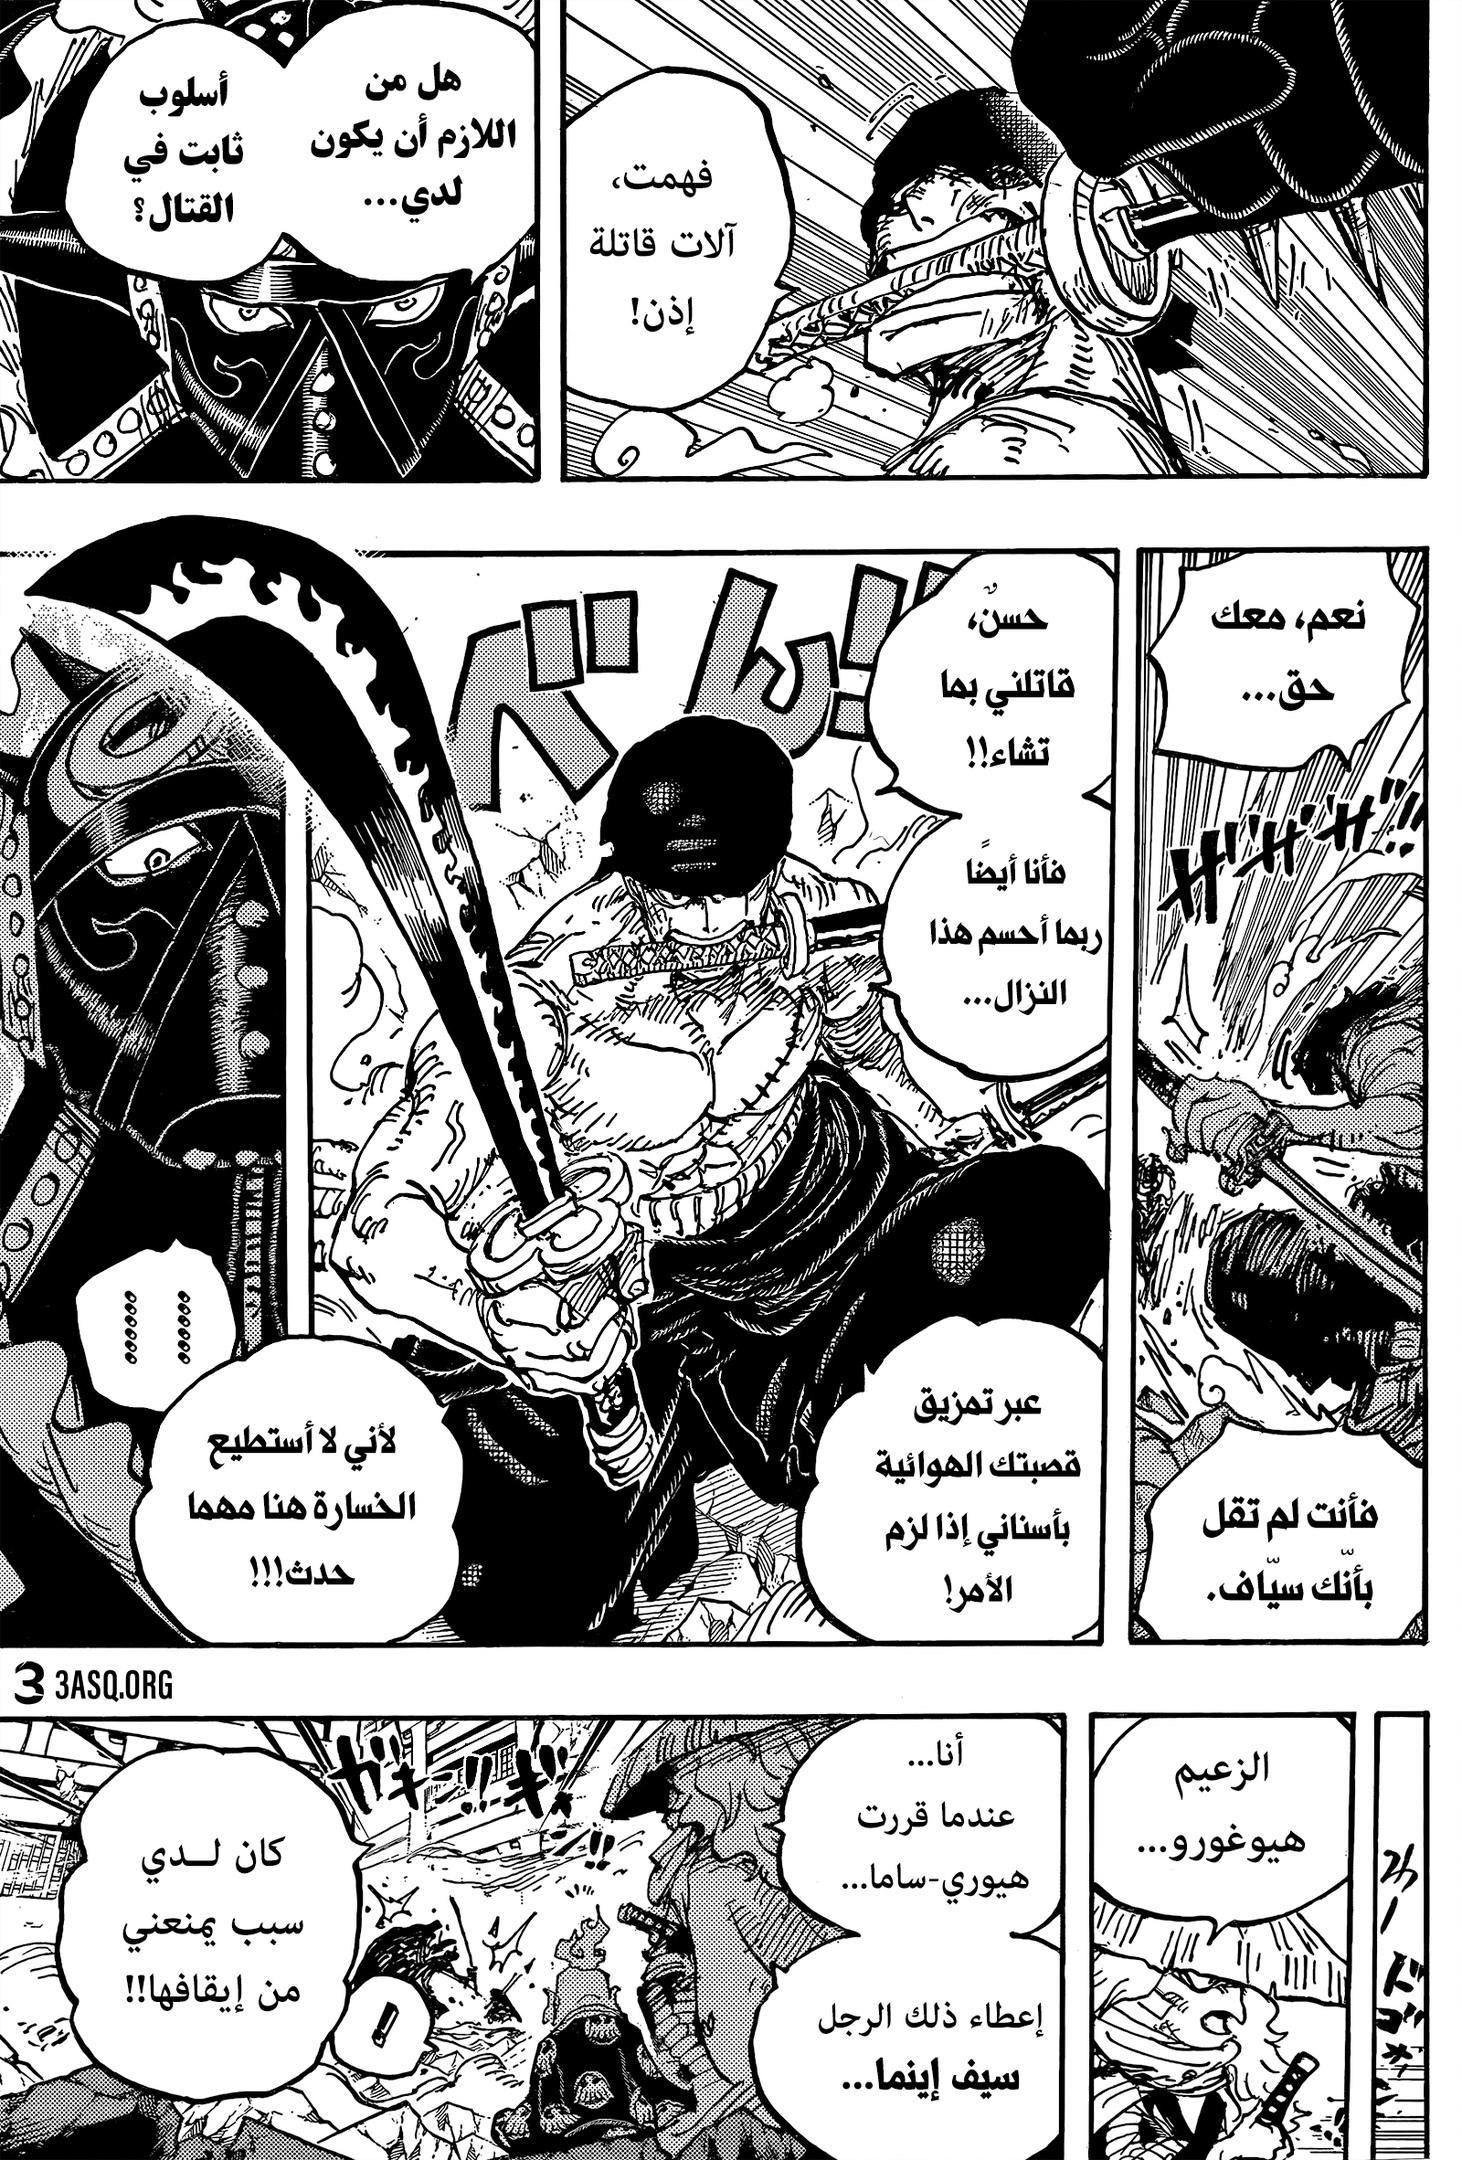 One Piece Arab 1023, image №10